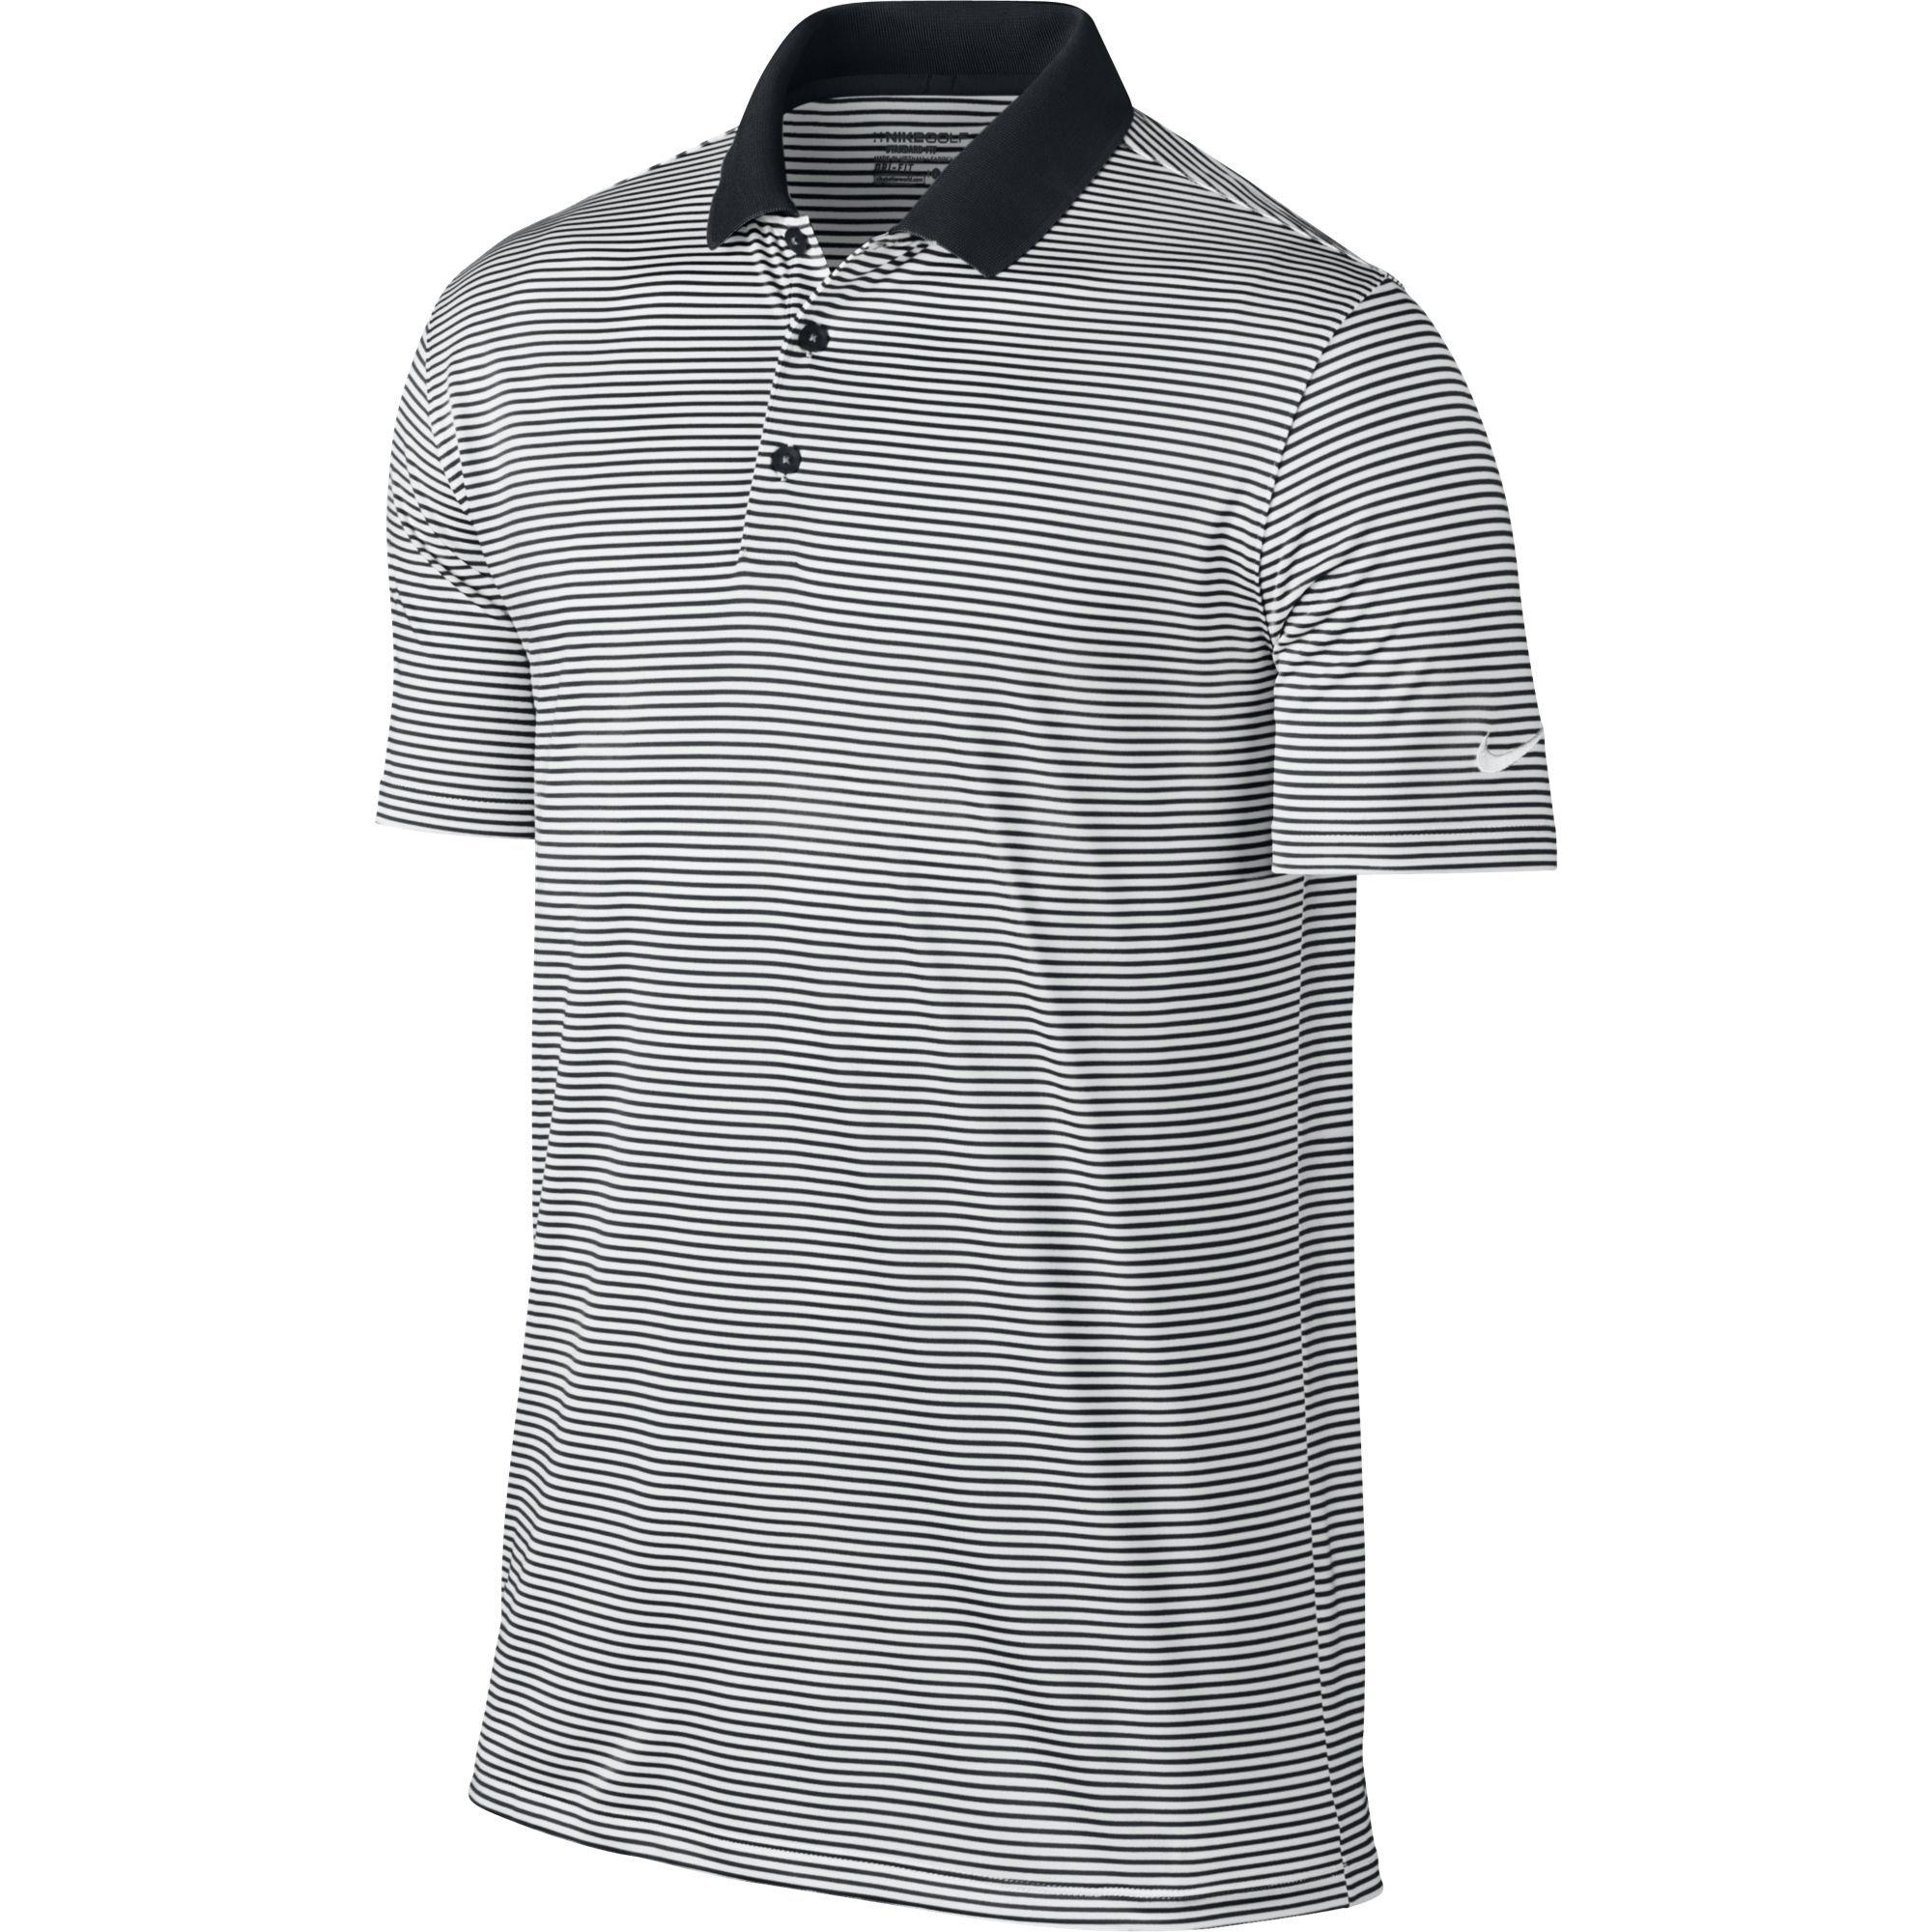 NIKE Men's Dry Victory Stripe Polo, Black/White/White, Small